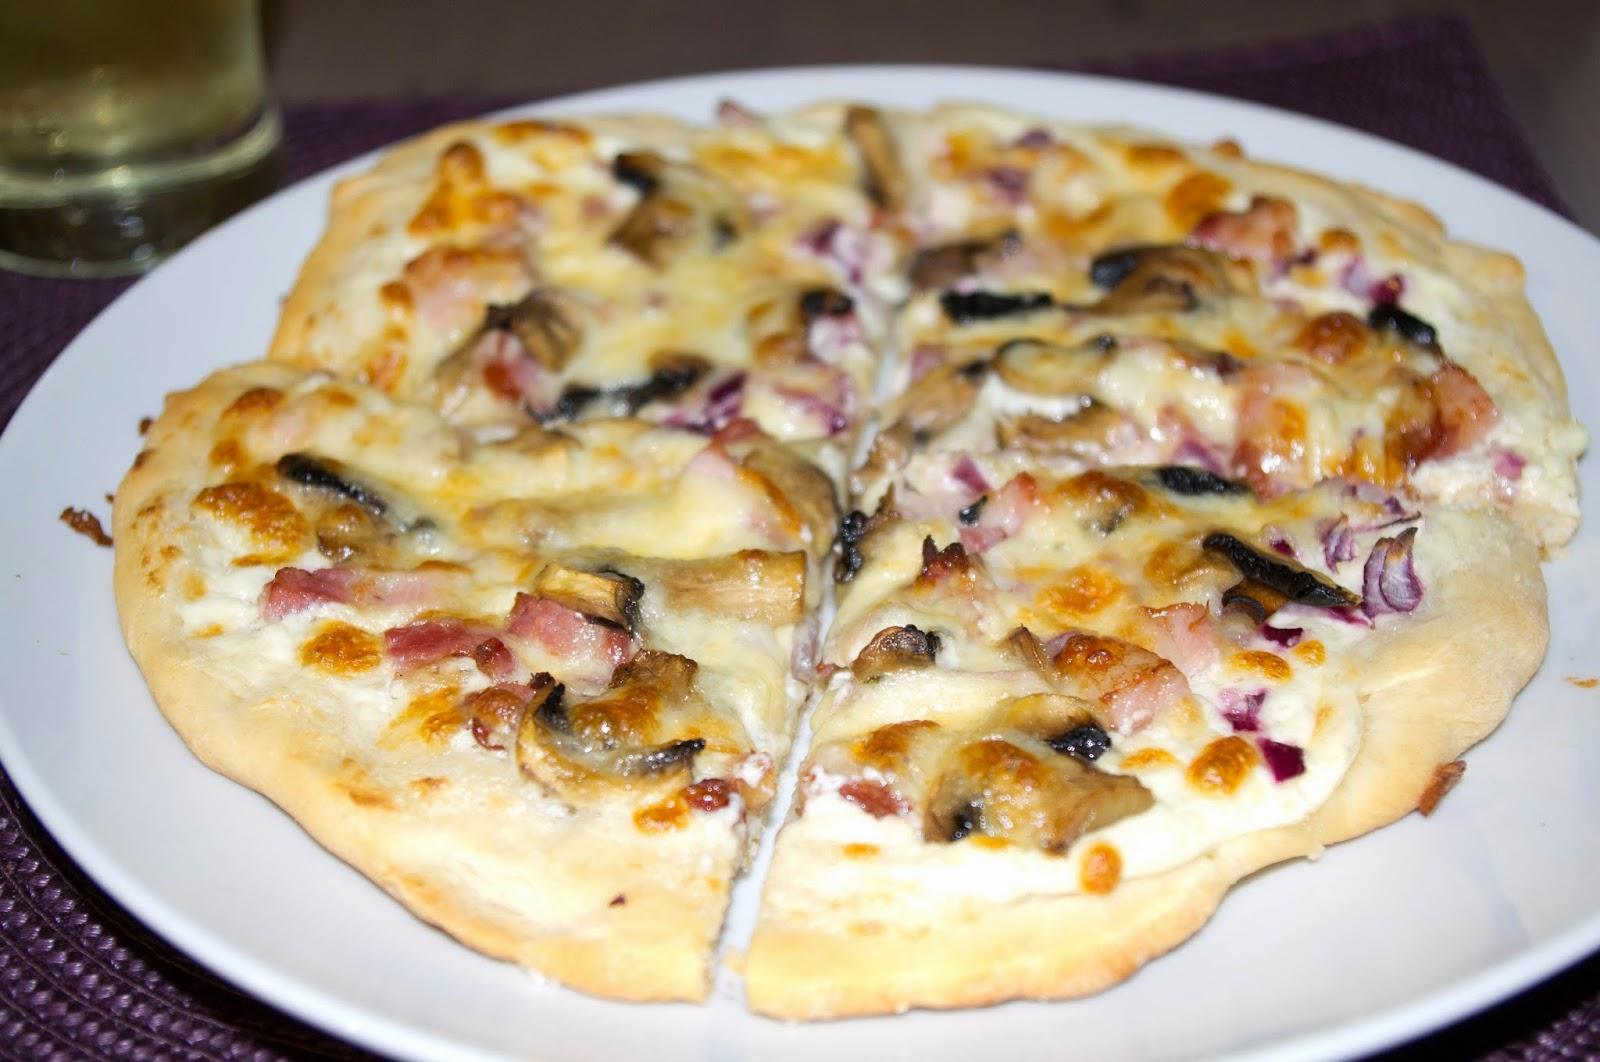 http://mojemenu.blogspot.com/2015/02/idealna-kolacja-na-tusty-czwartek-pizza.html